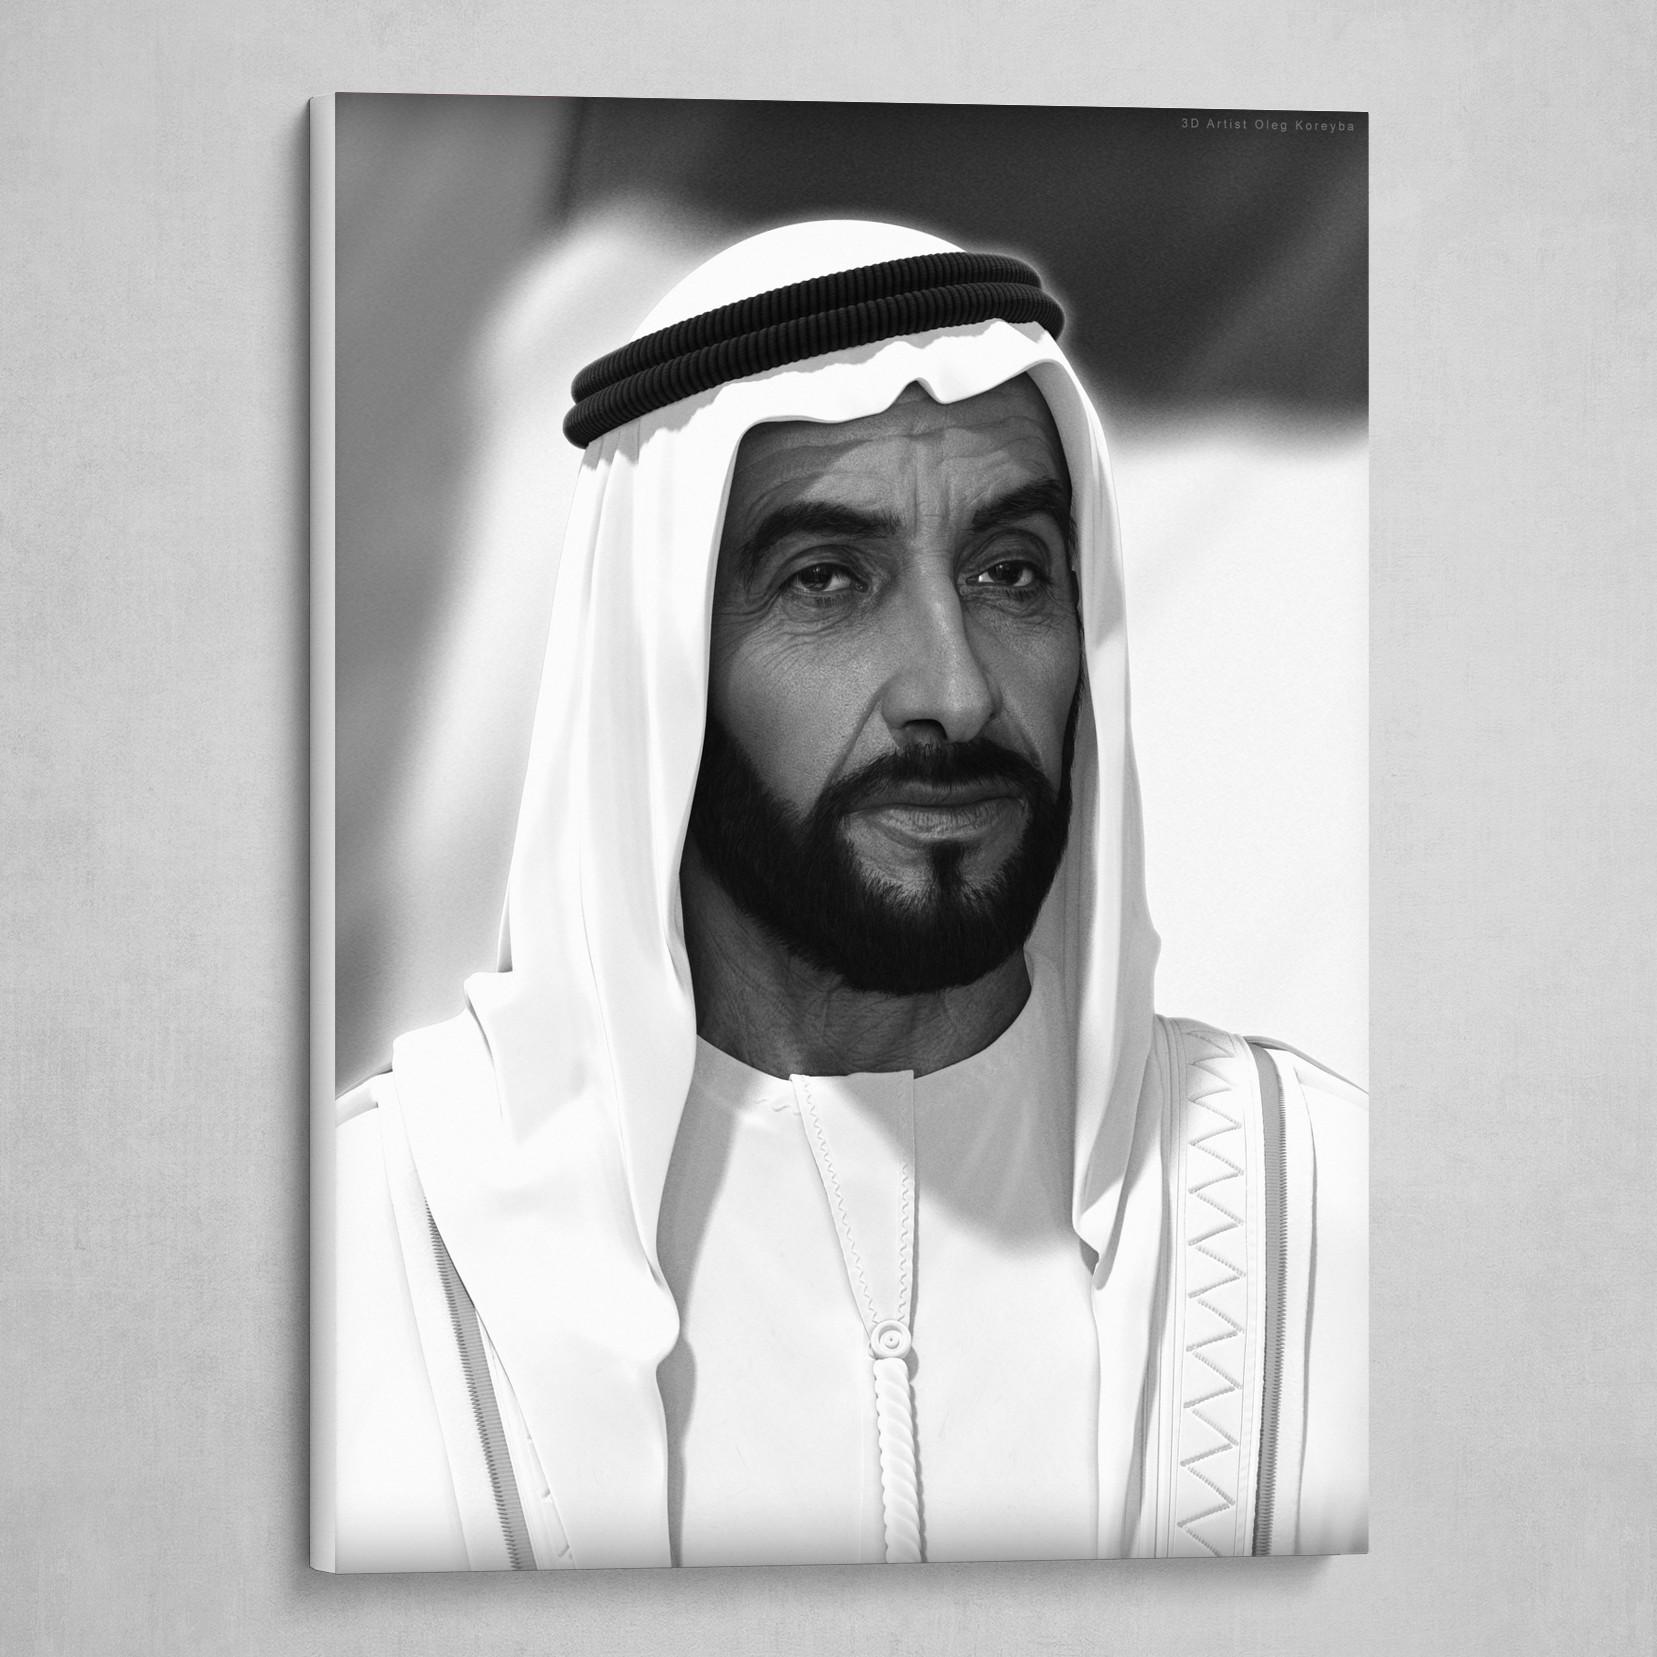 3D portrait of Sheikh Zayed bin Sultan Al Nahyan